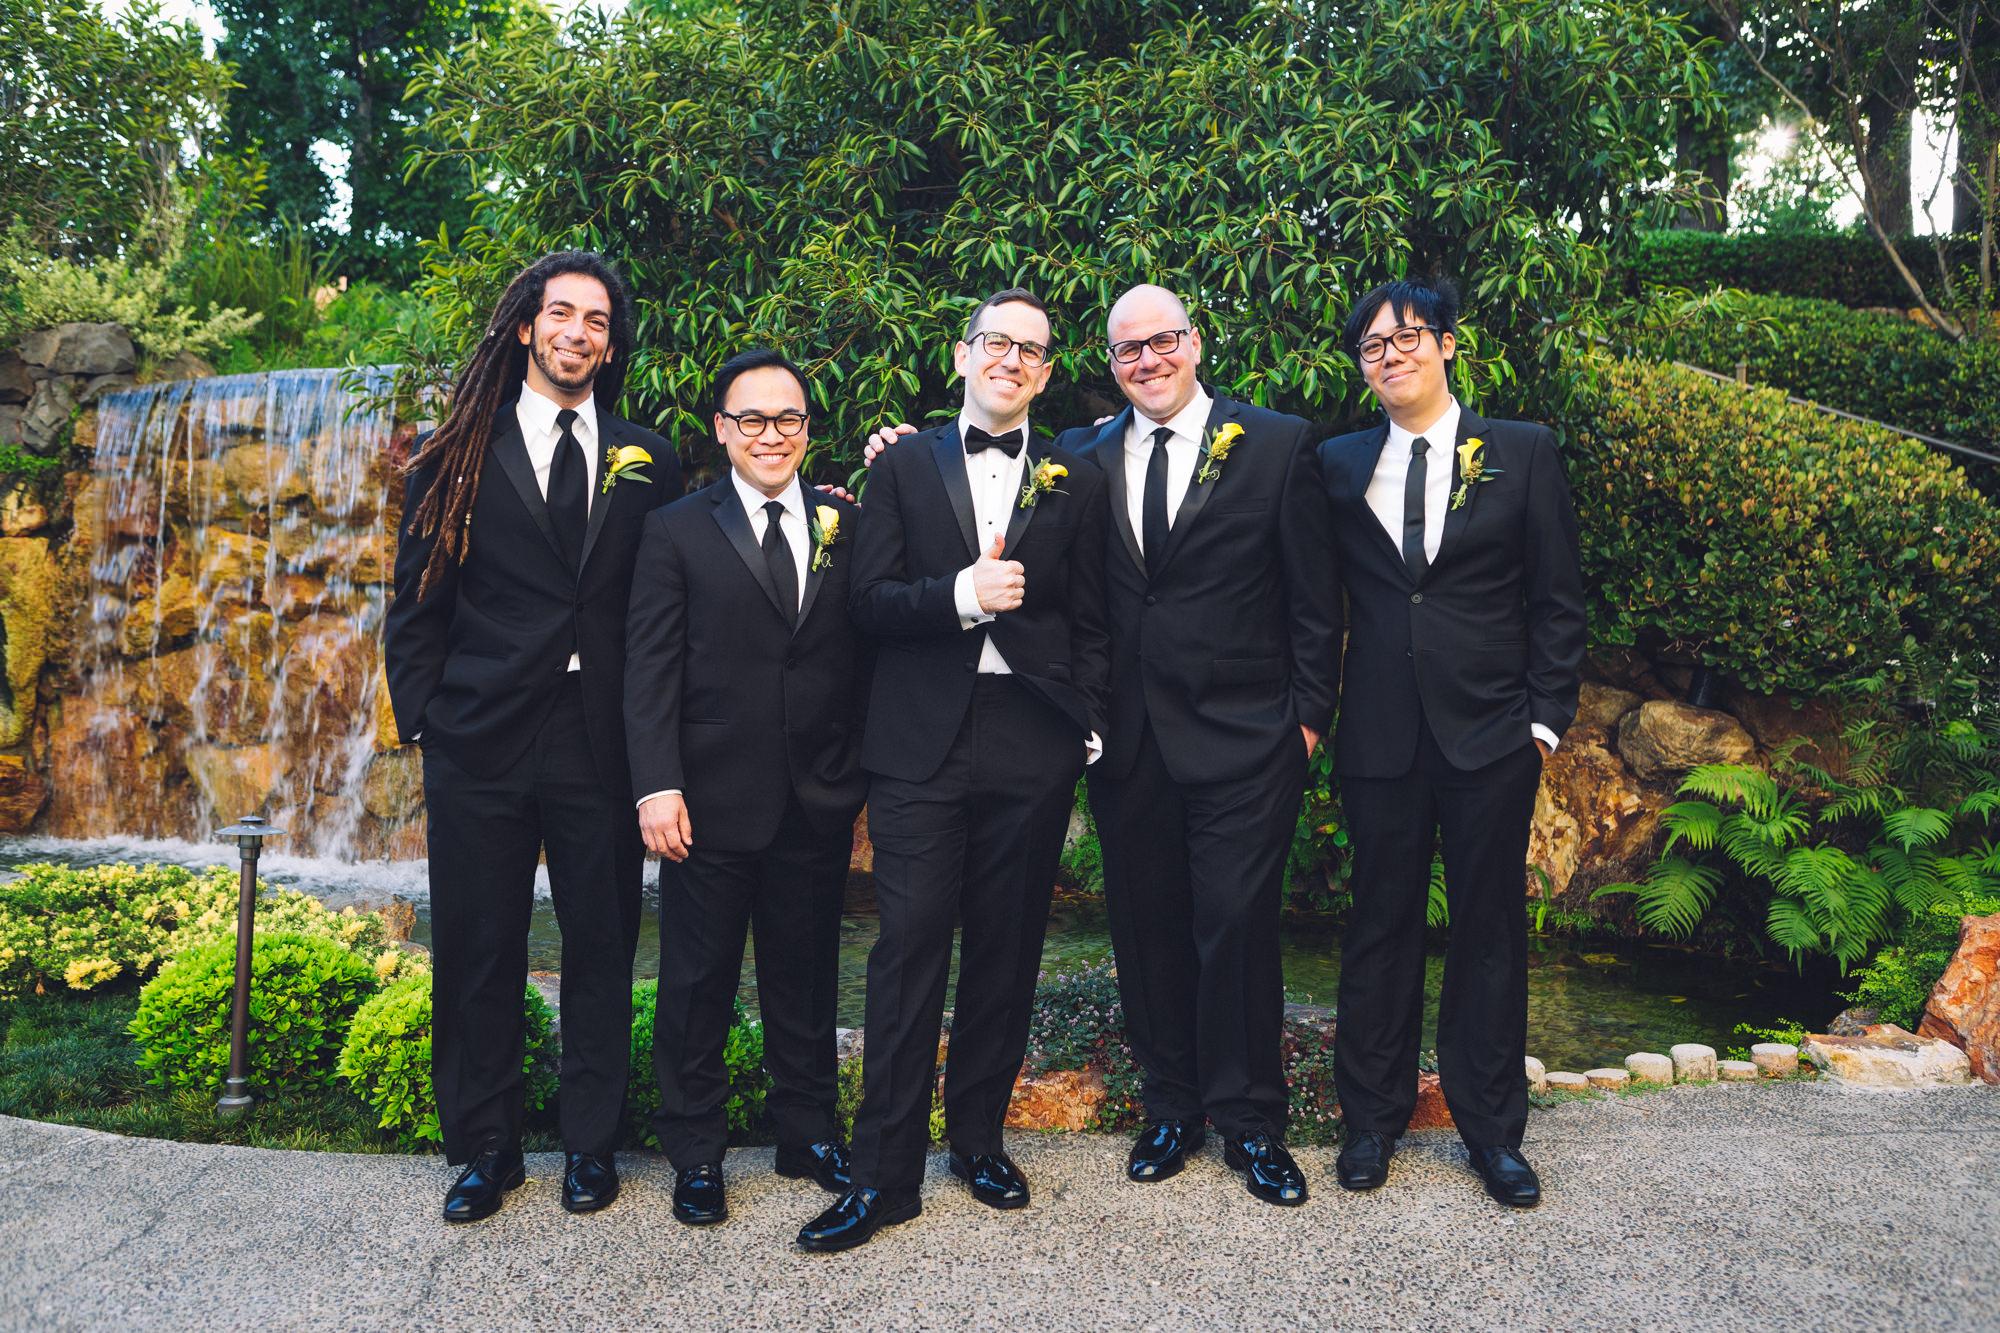 thelightandglass-wedding-engagement-photography-106.jpg